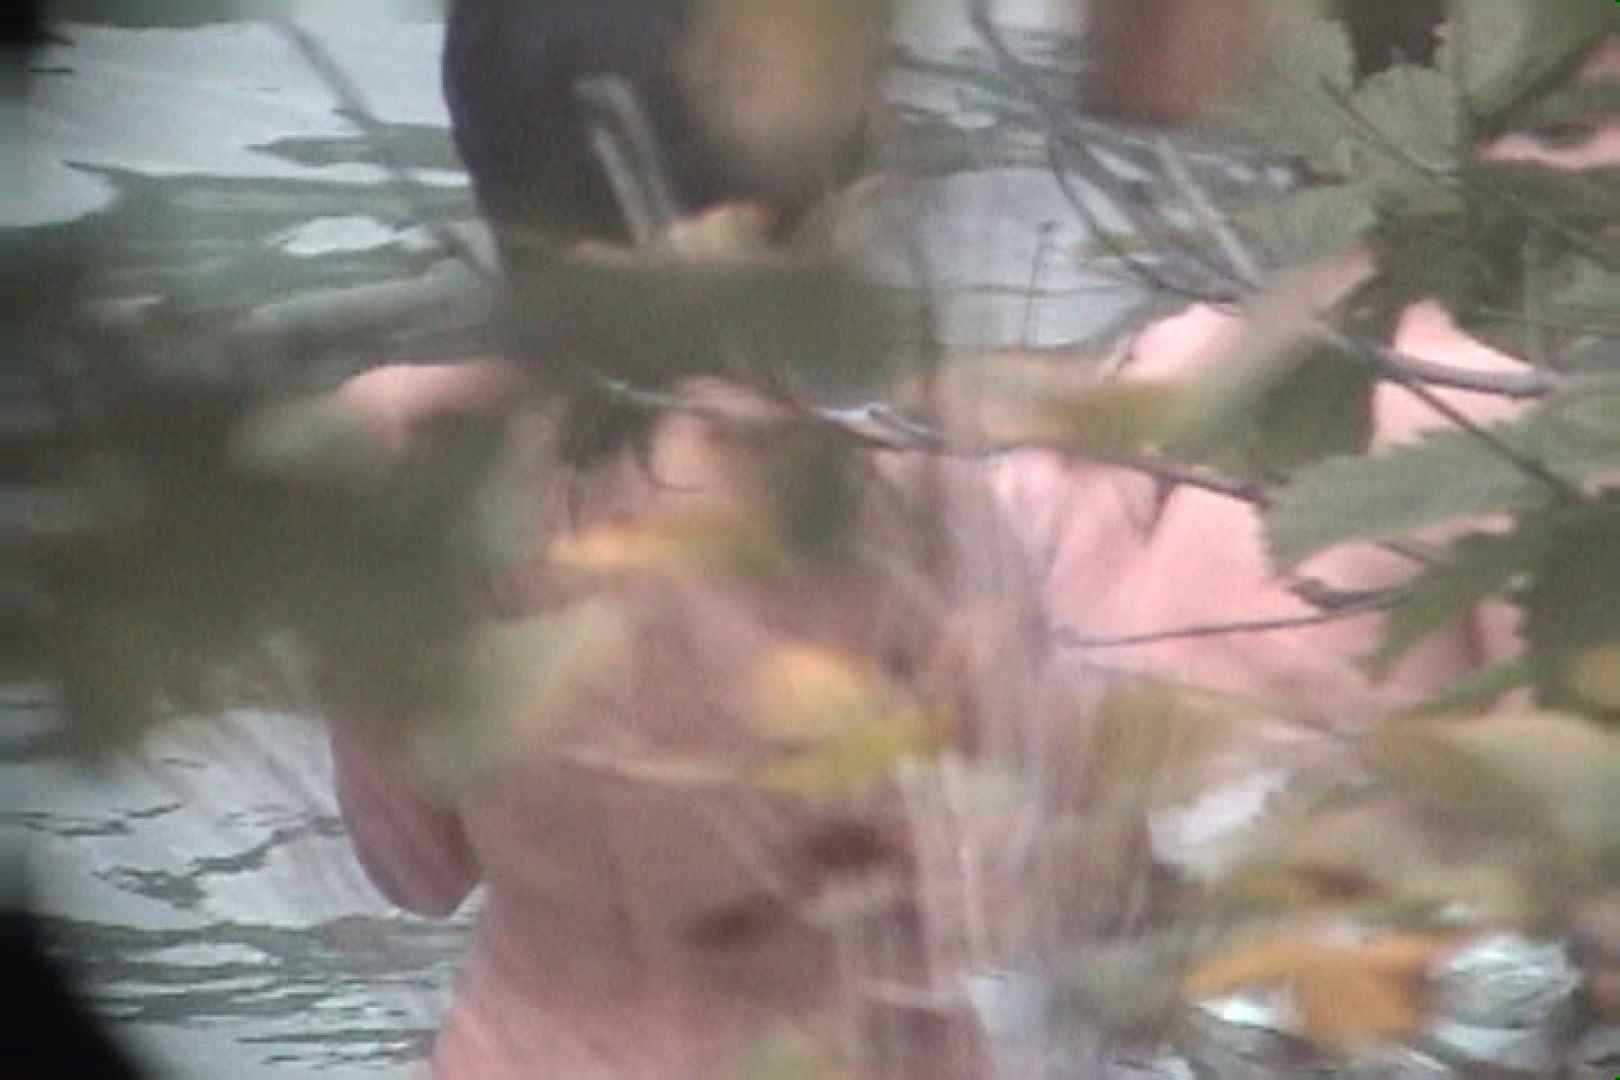 Aquaな露天風呂Vol.71【VIP限定】 OLエロ画像 覗きオメコ動画キャプチャ 68PICs 23